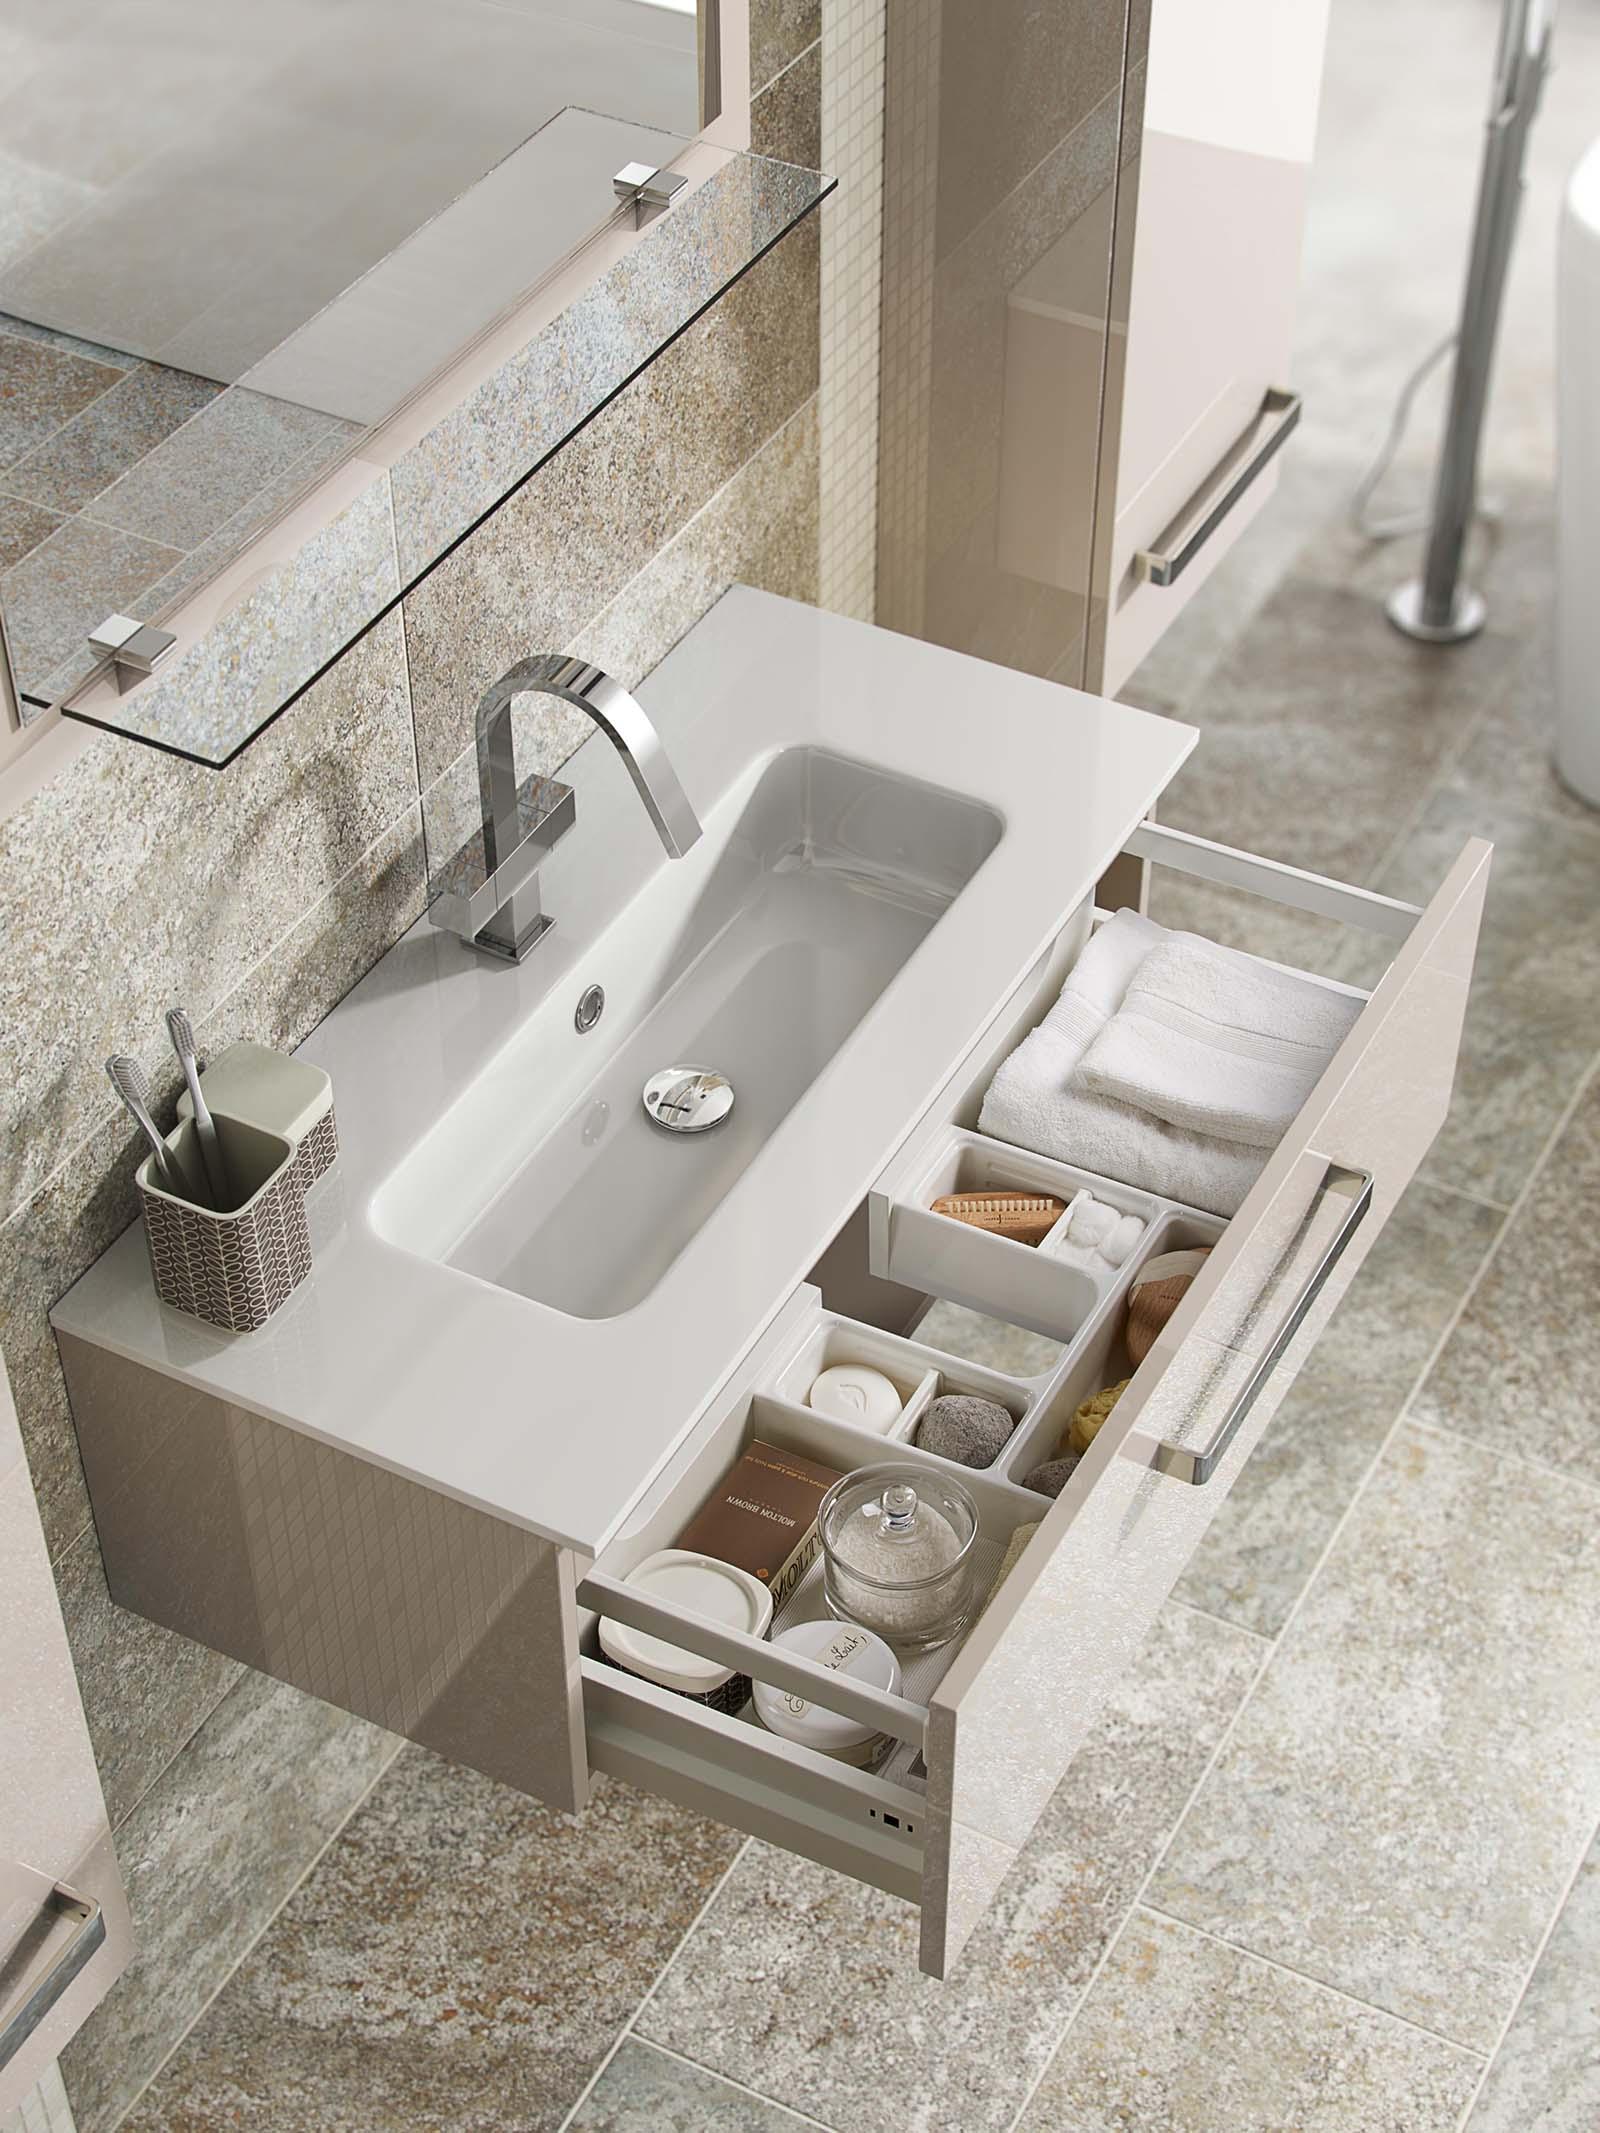 Portfolio_Interior_Product_Bathroom_Set_D_Closeup_1600